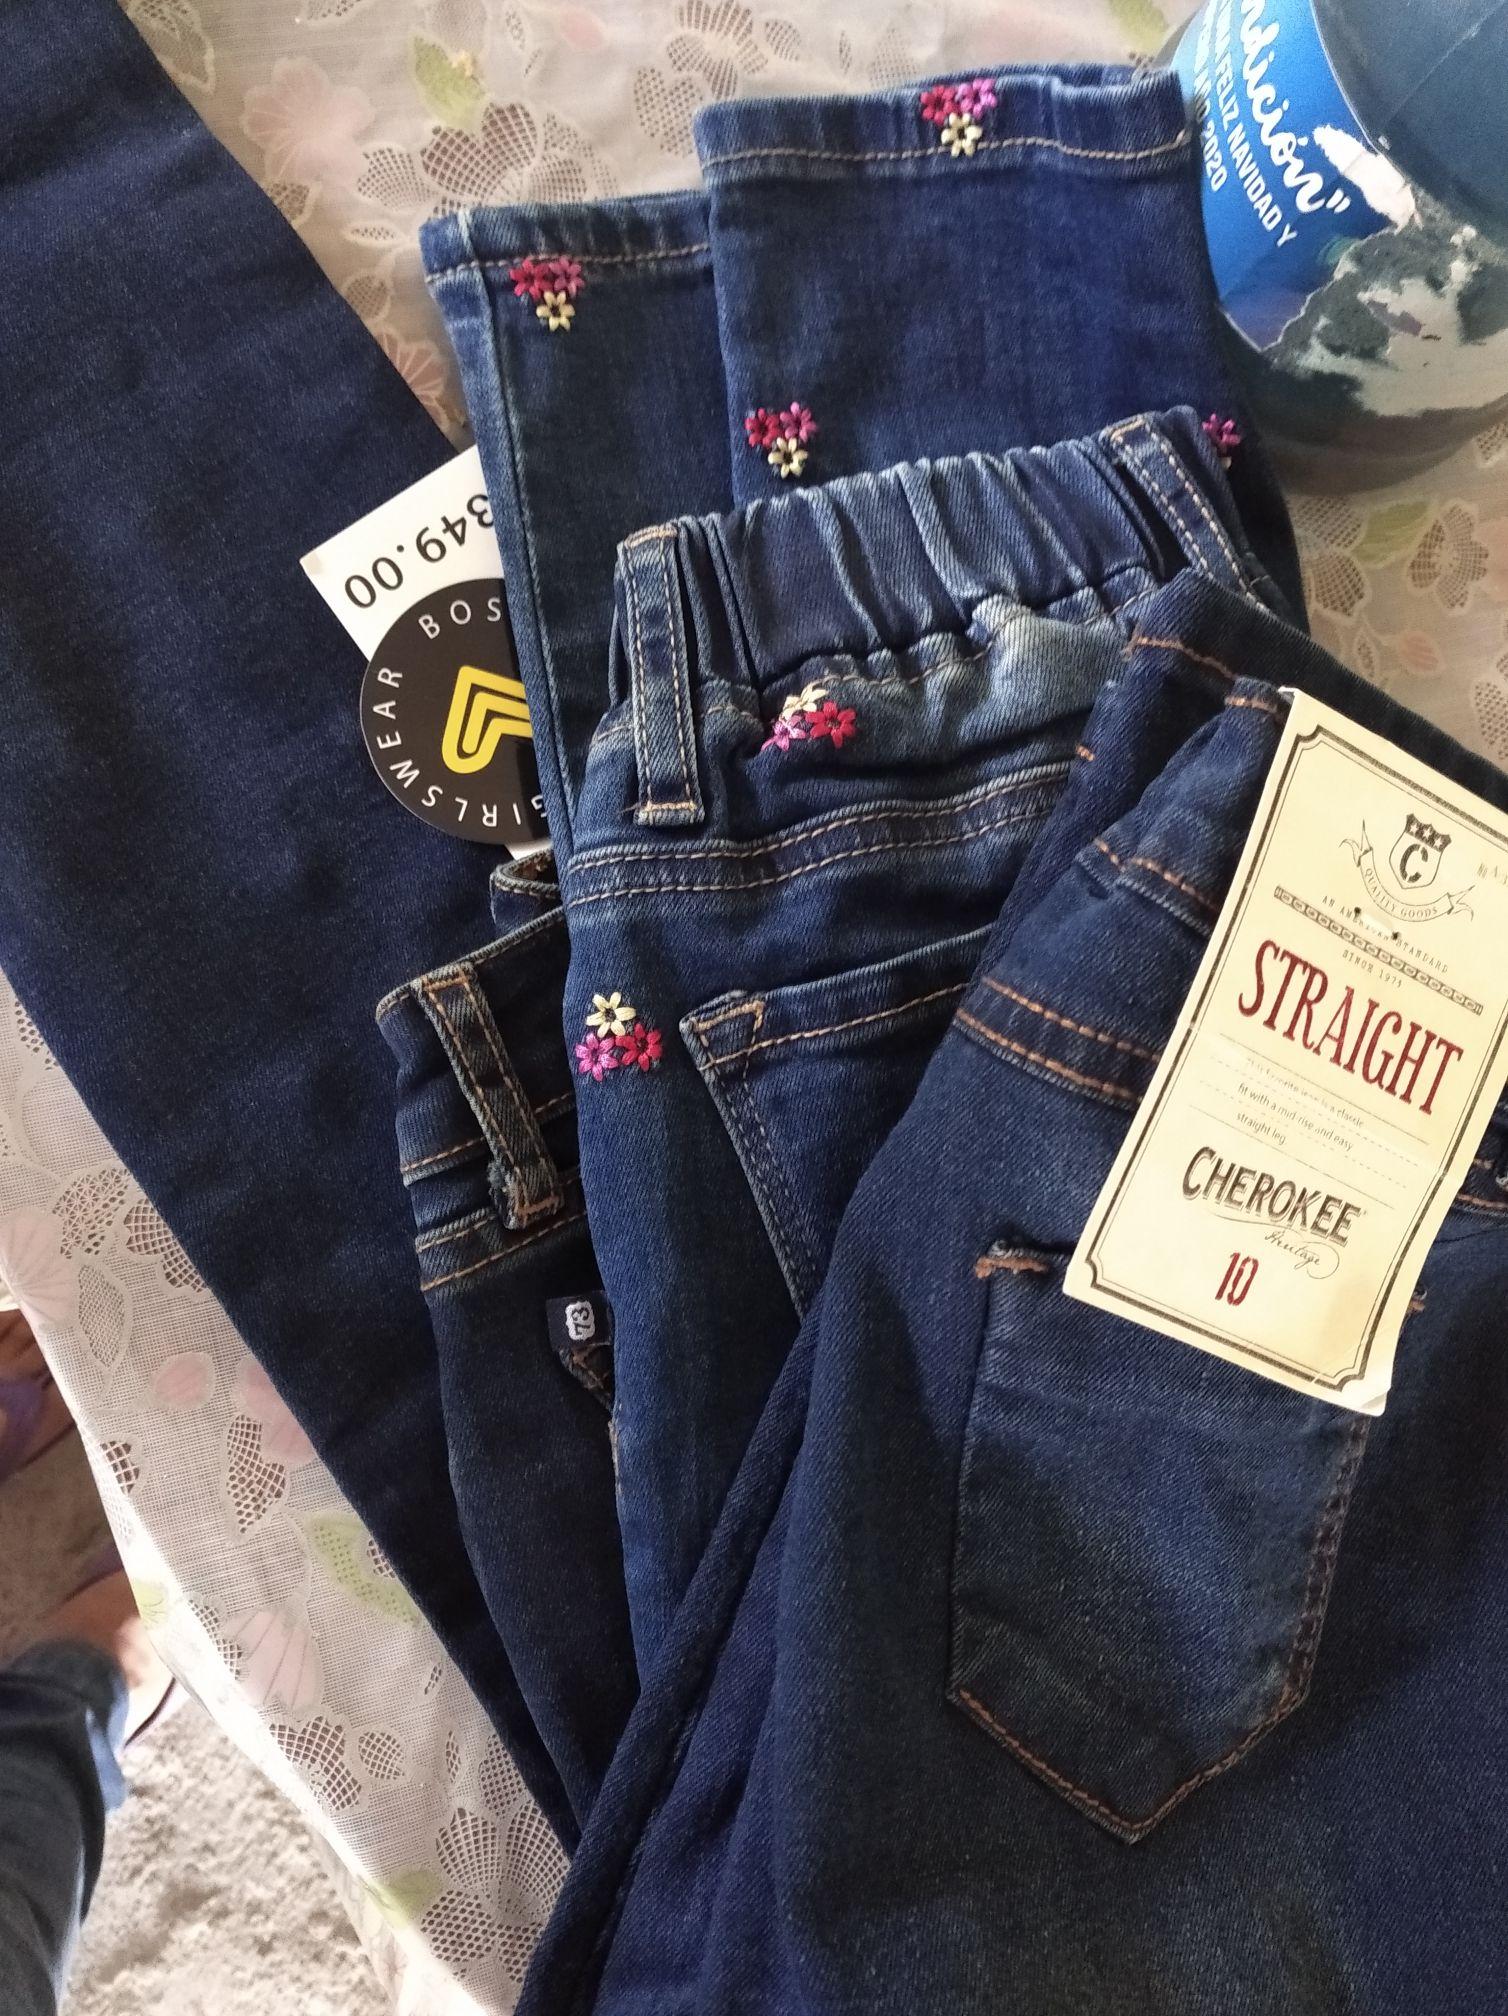 Jeans 20 Soriana Tuxtla Gtz Plaza Sol Promodescuentos Com